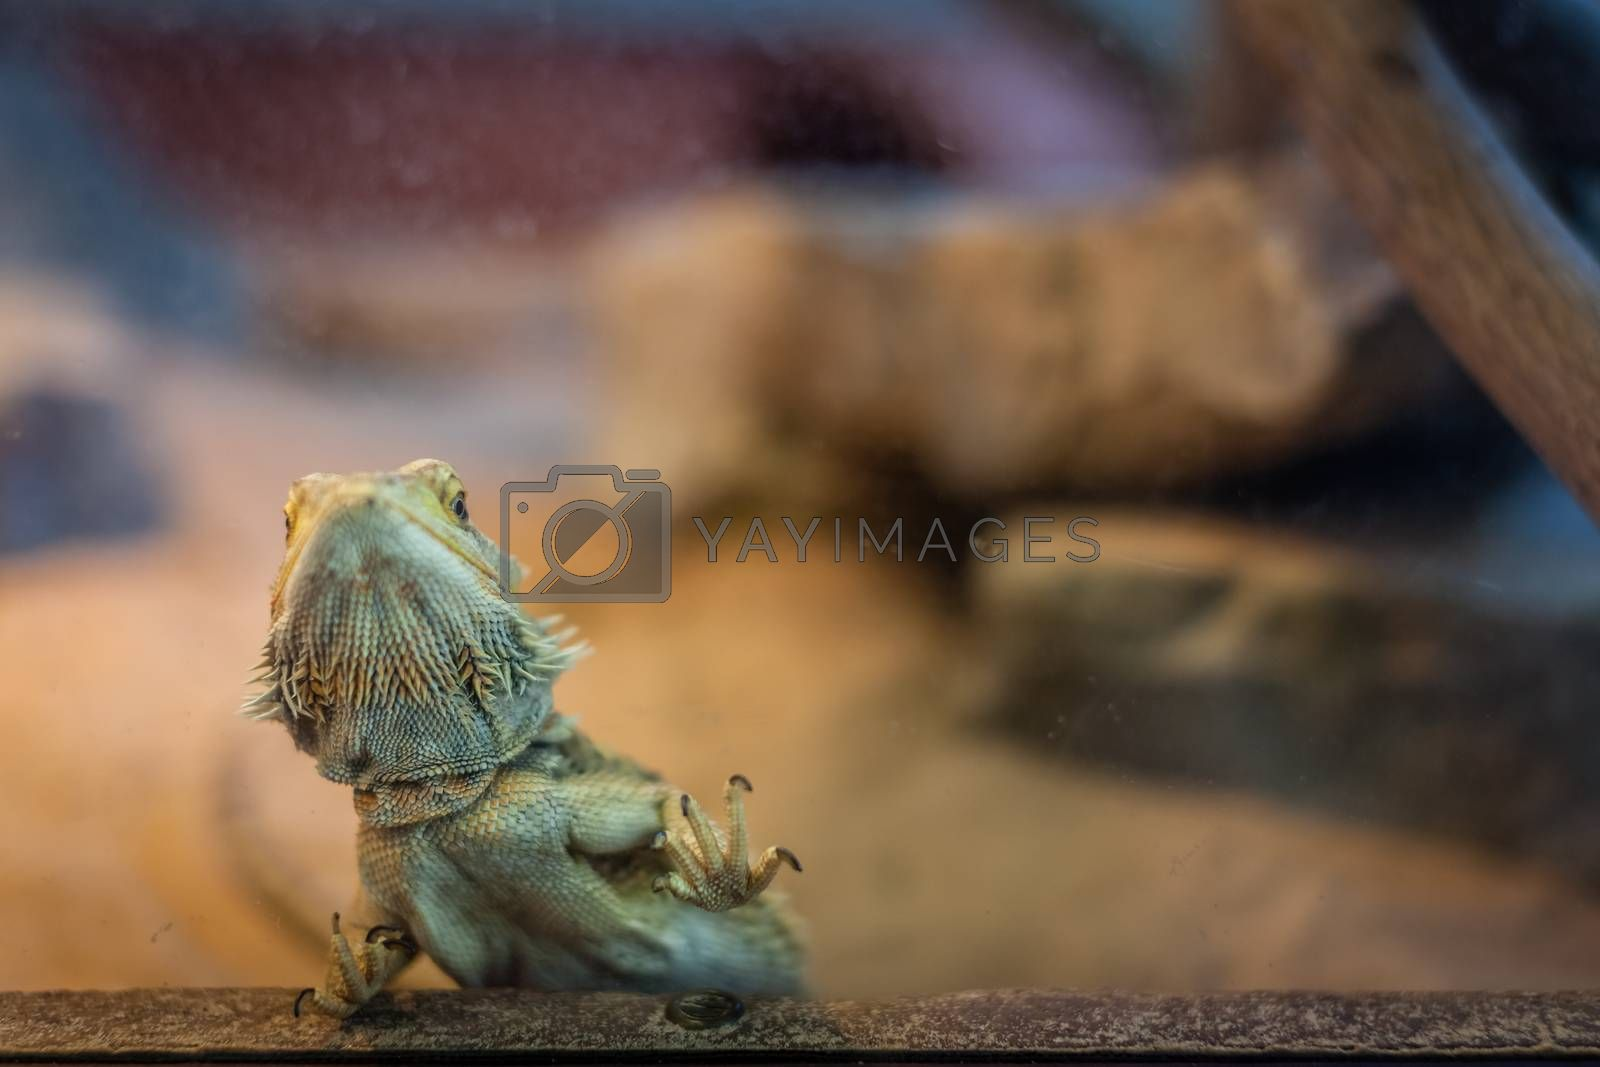 Bearded Dragon lizard looking throgh the cage window in a zoo